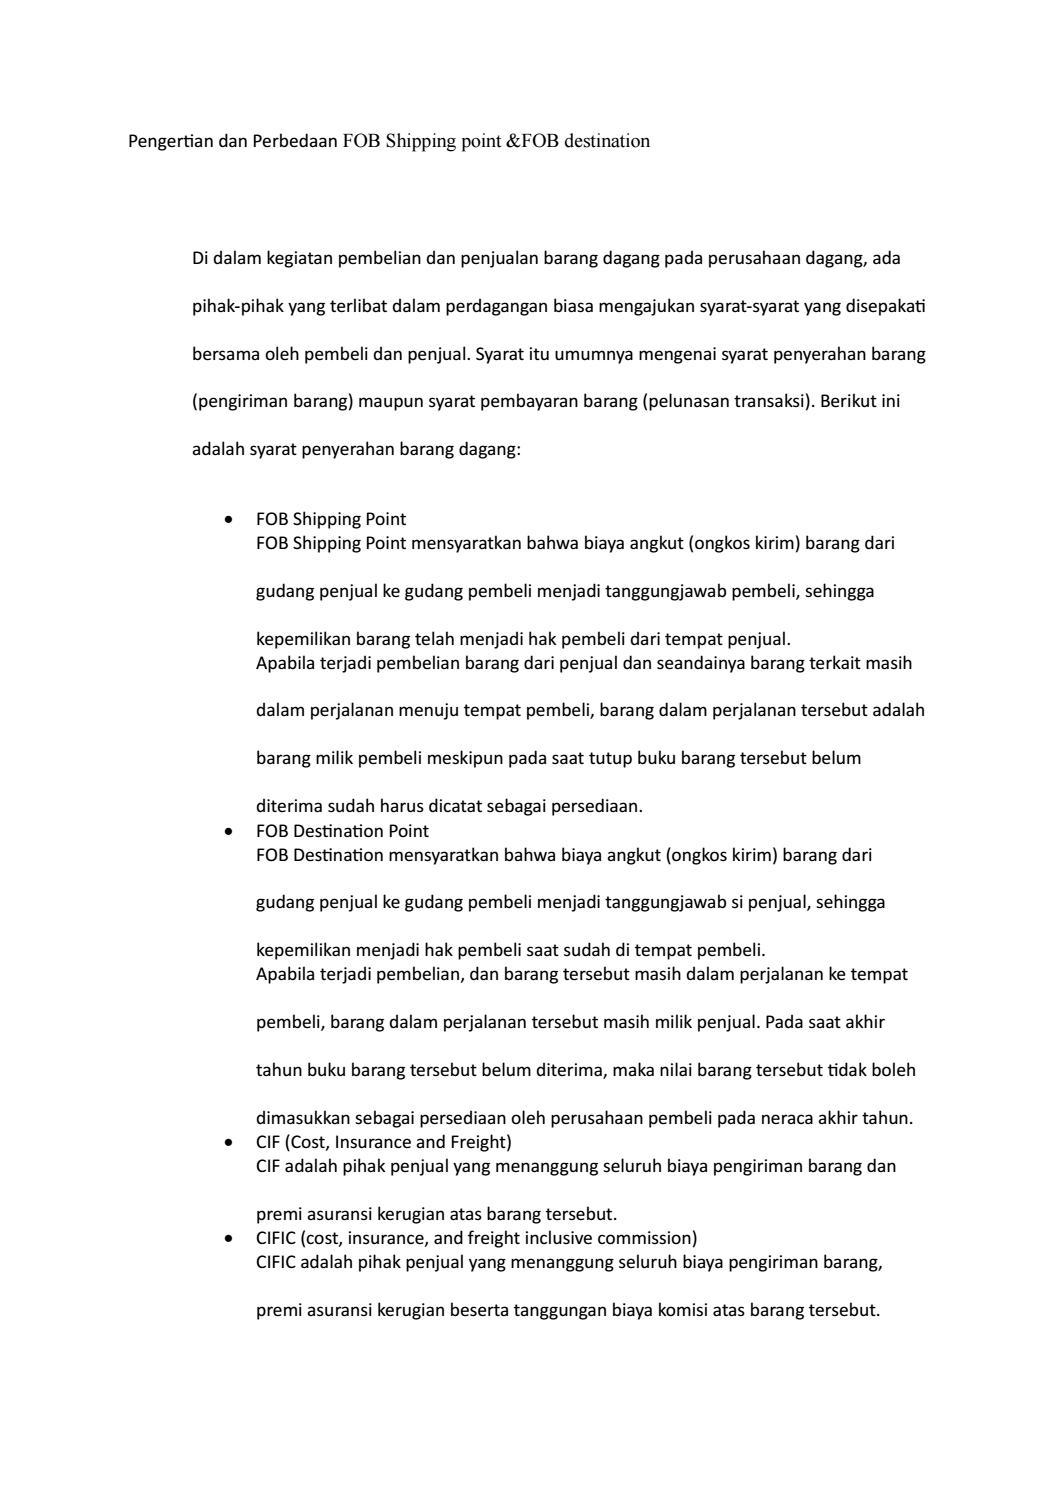 Syarat Penyerahan Barang Dagang : syarat, penyerahan, barang, dagang, Pengertian, Perbedaan, Shipping, Point, Akuntansi, Lengkap, Issuu